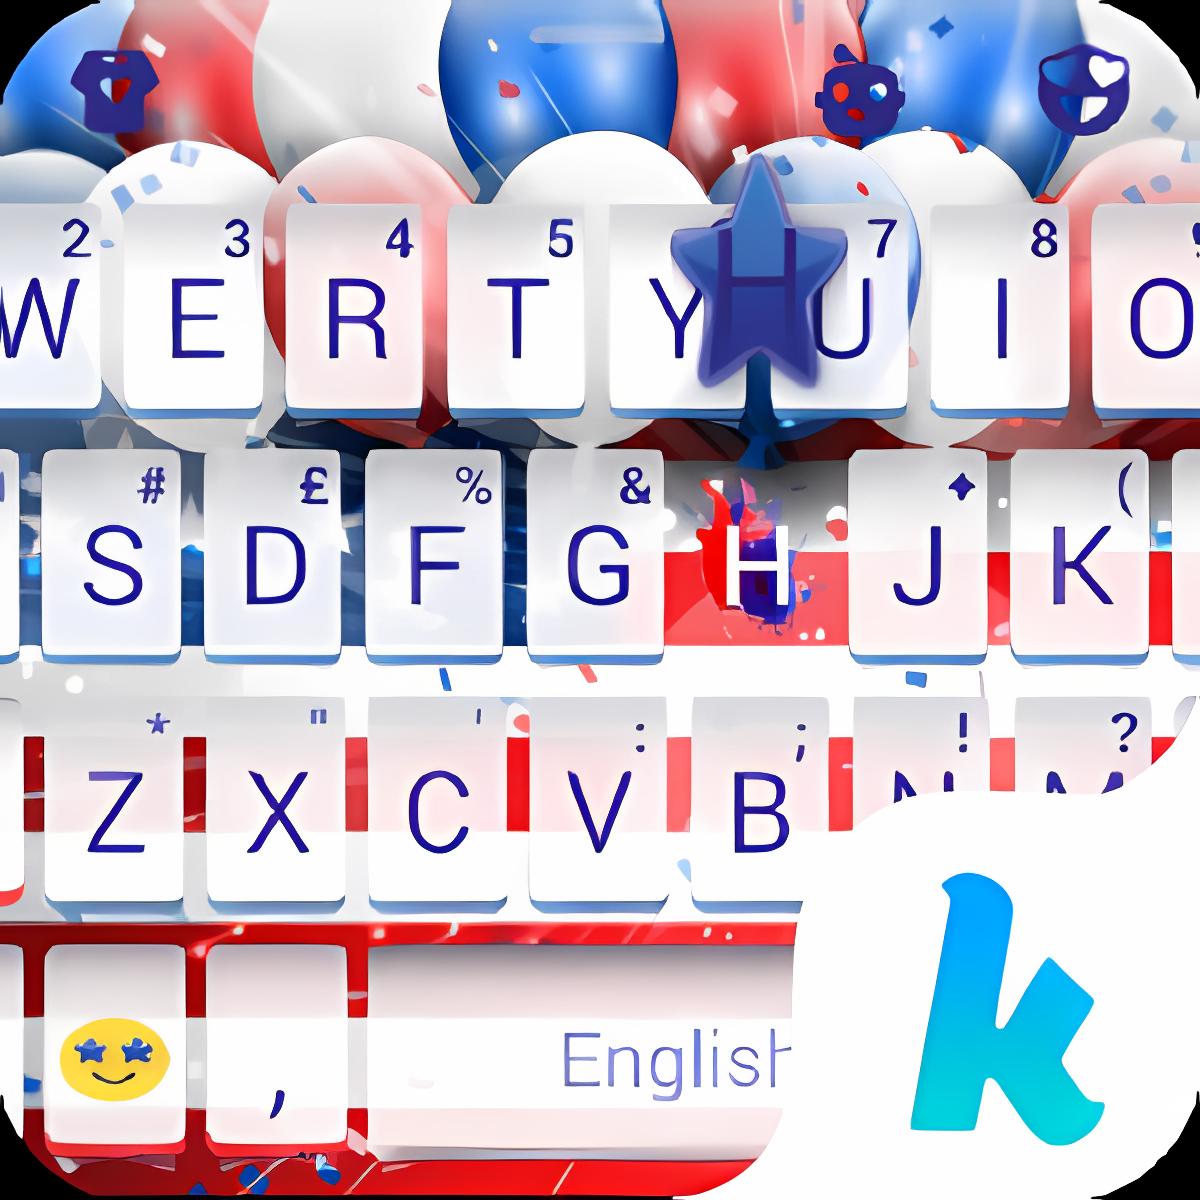 Keyboard - 4th of July New Free Theme